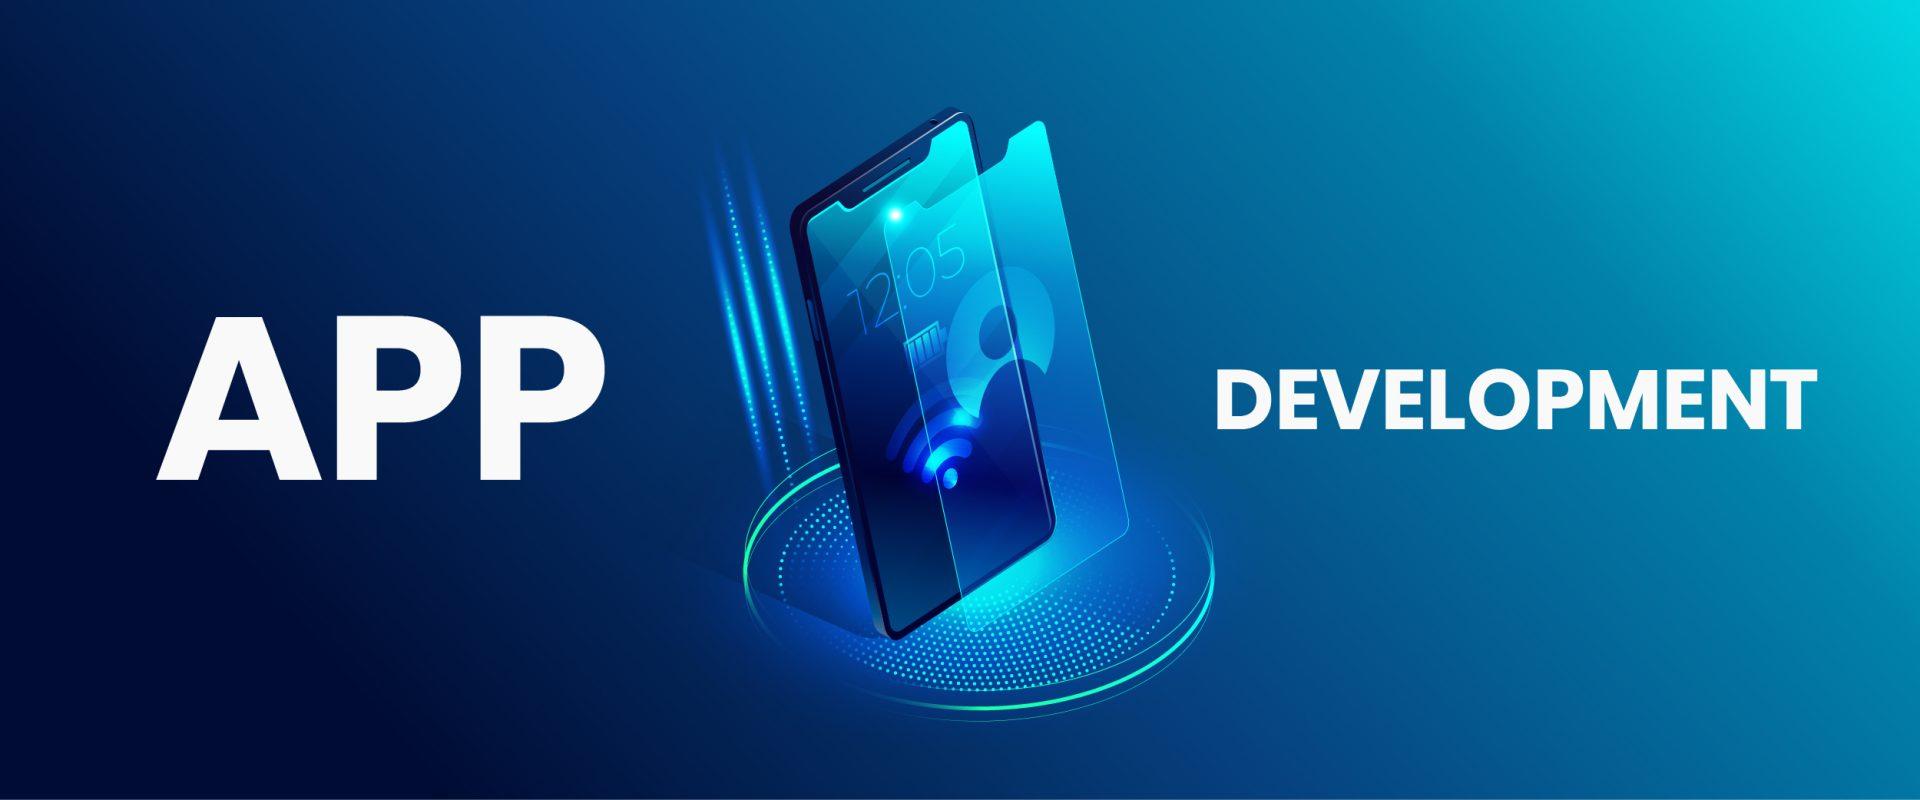 Best App Development service in Karachi - Pakistan